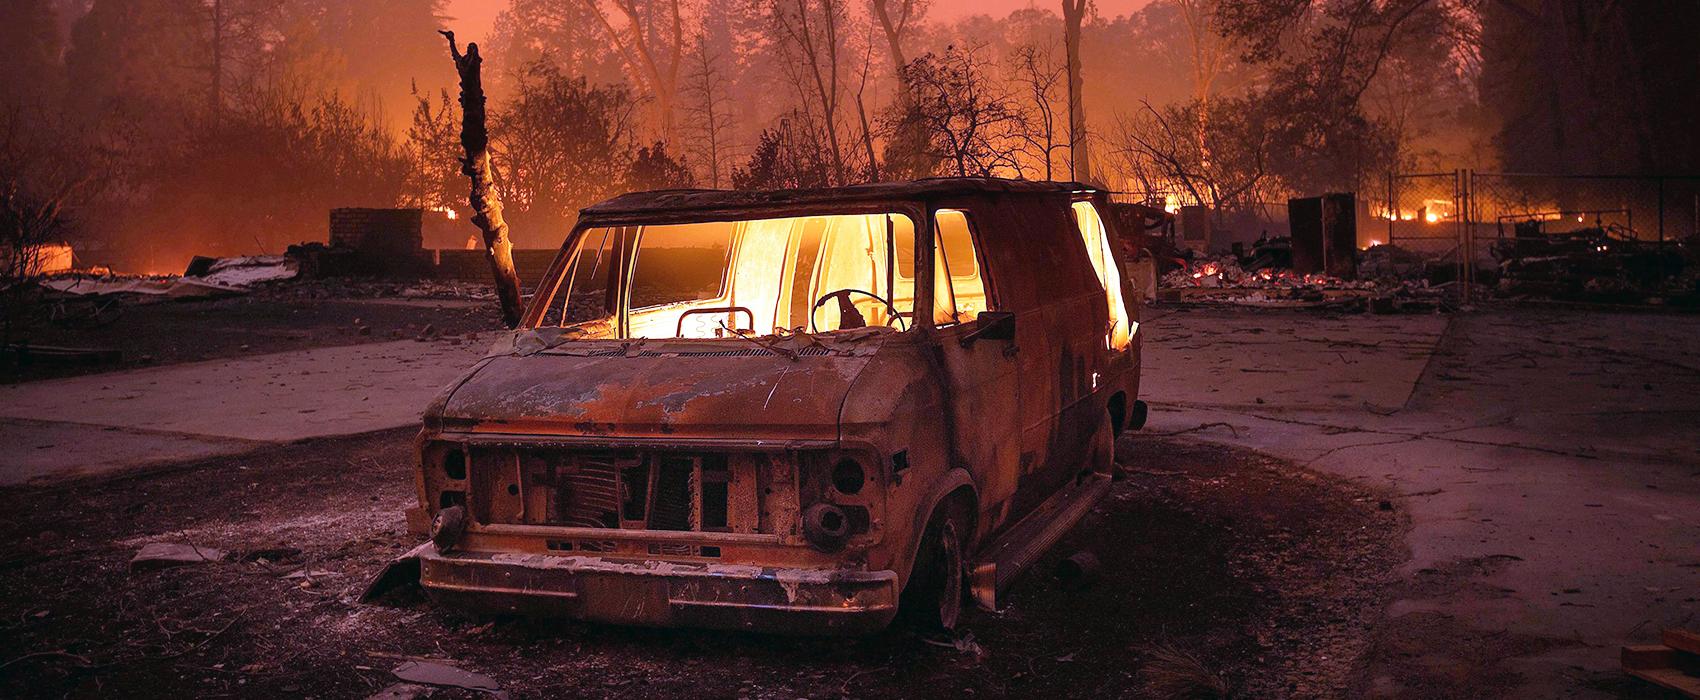 Fethullah Gulen's Message of Condolences on California Wildfires